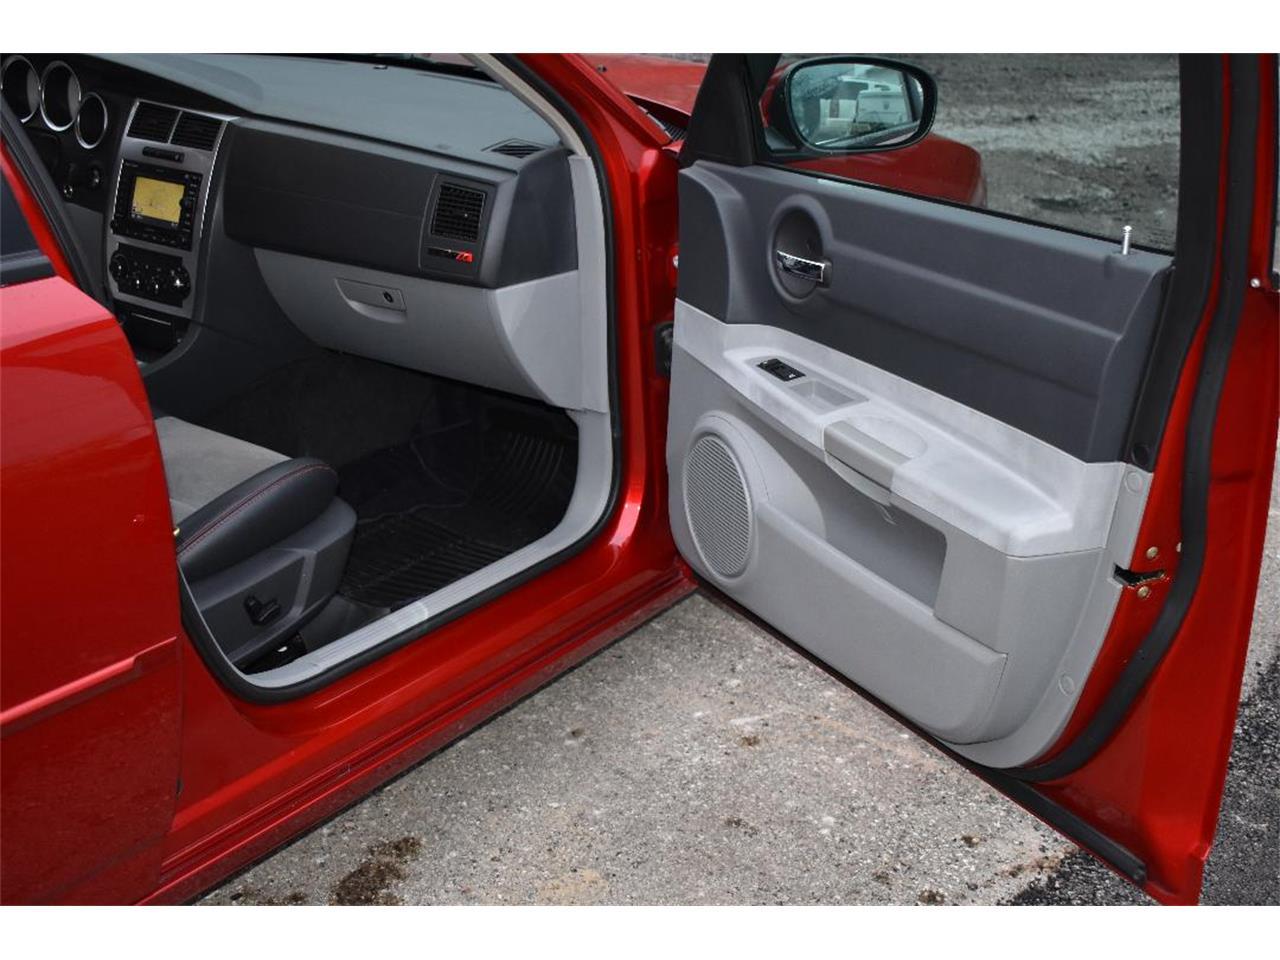 2006 Dodge Charger (CC-1234852) for sale in ALLISON PARK, Pennsylvania